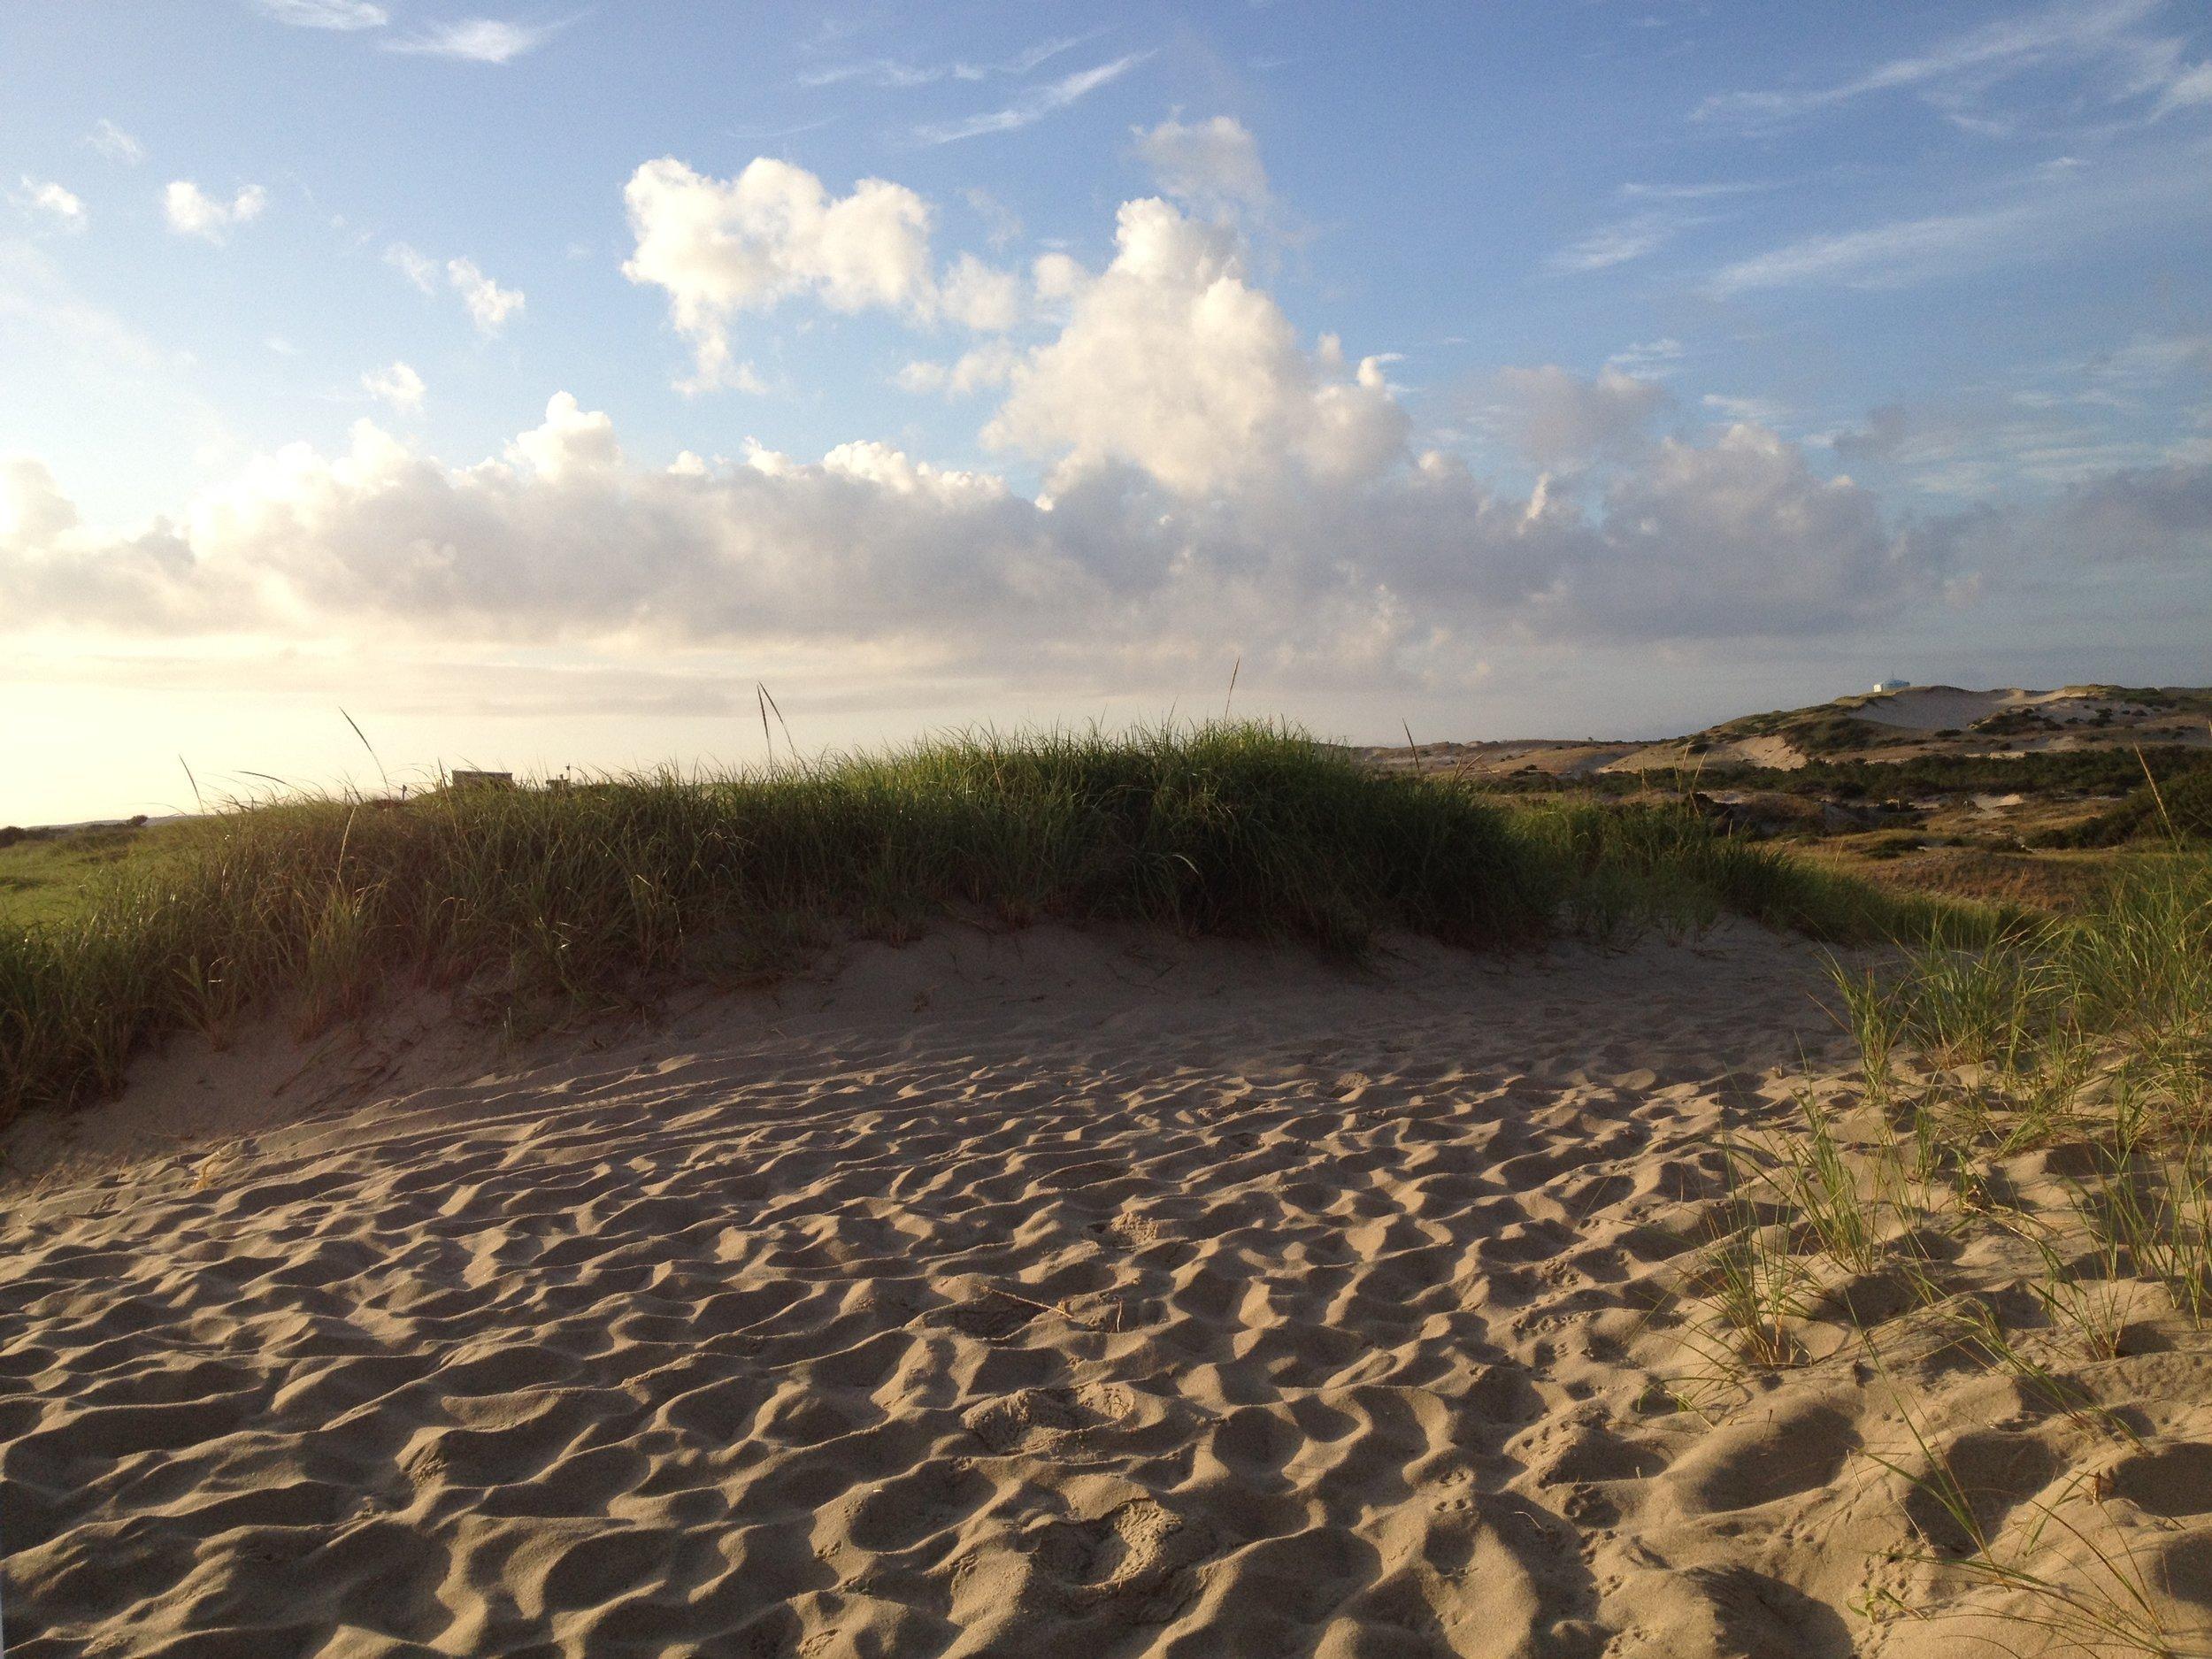 Sand Dunes near Wellfleet, MA, on Cape Cod